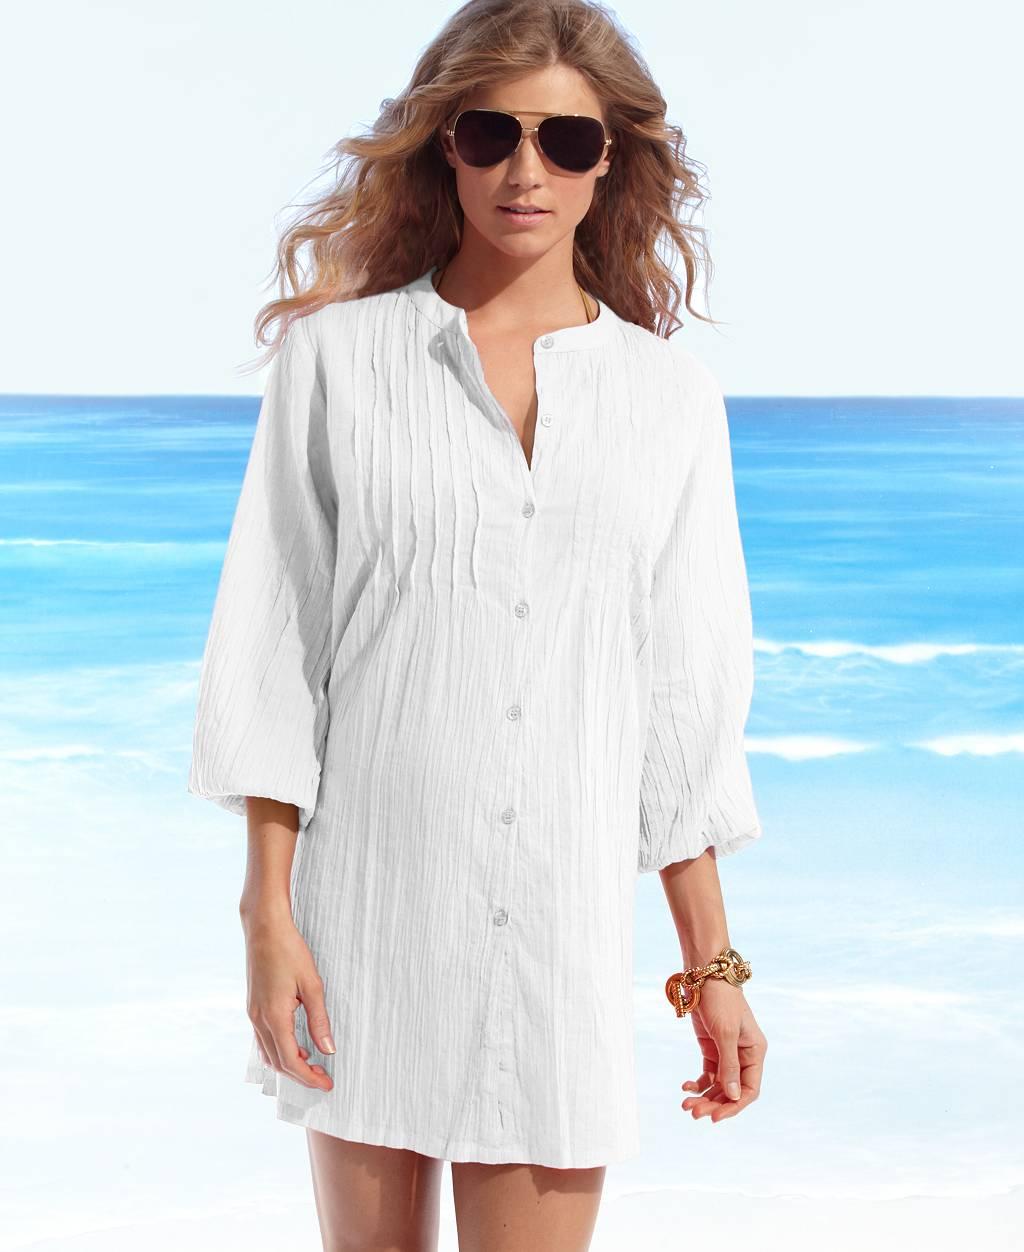 Белая рубашка на пляж фото